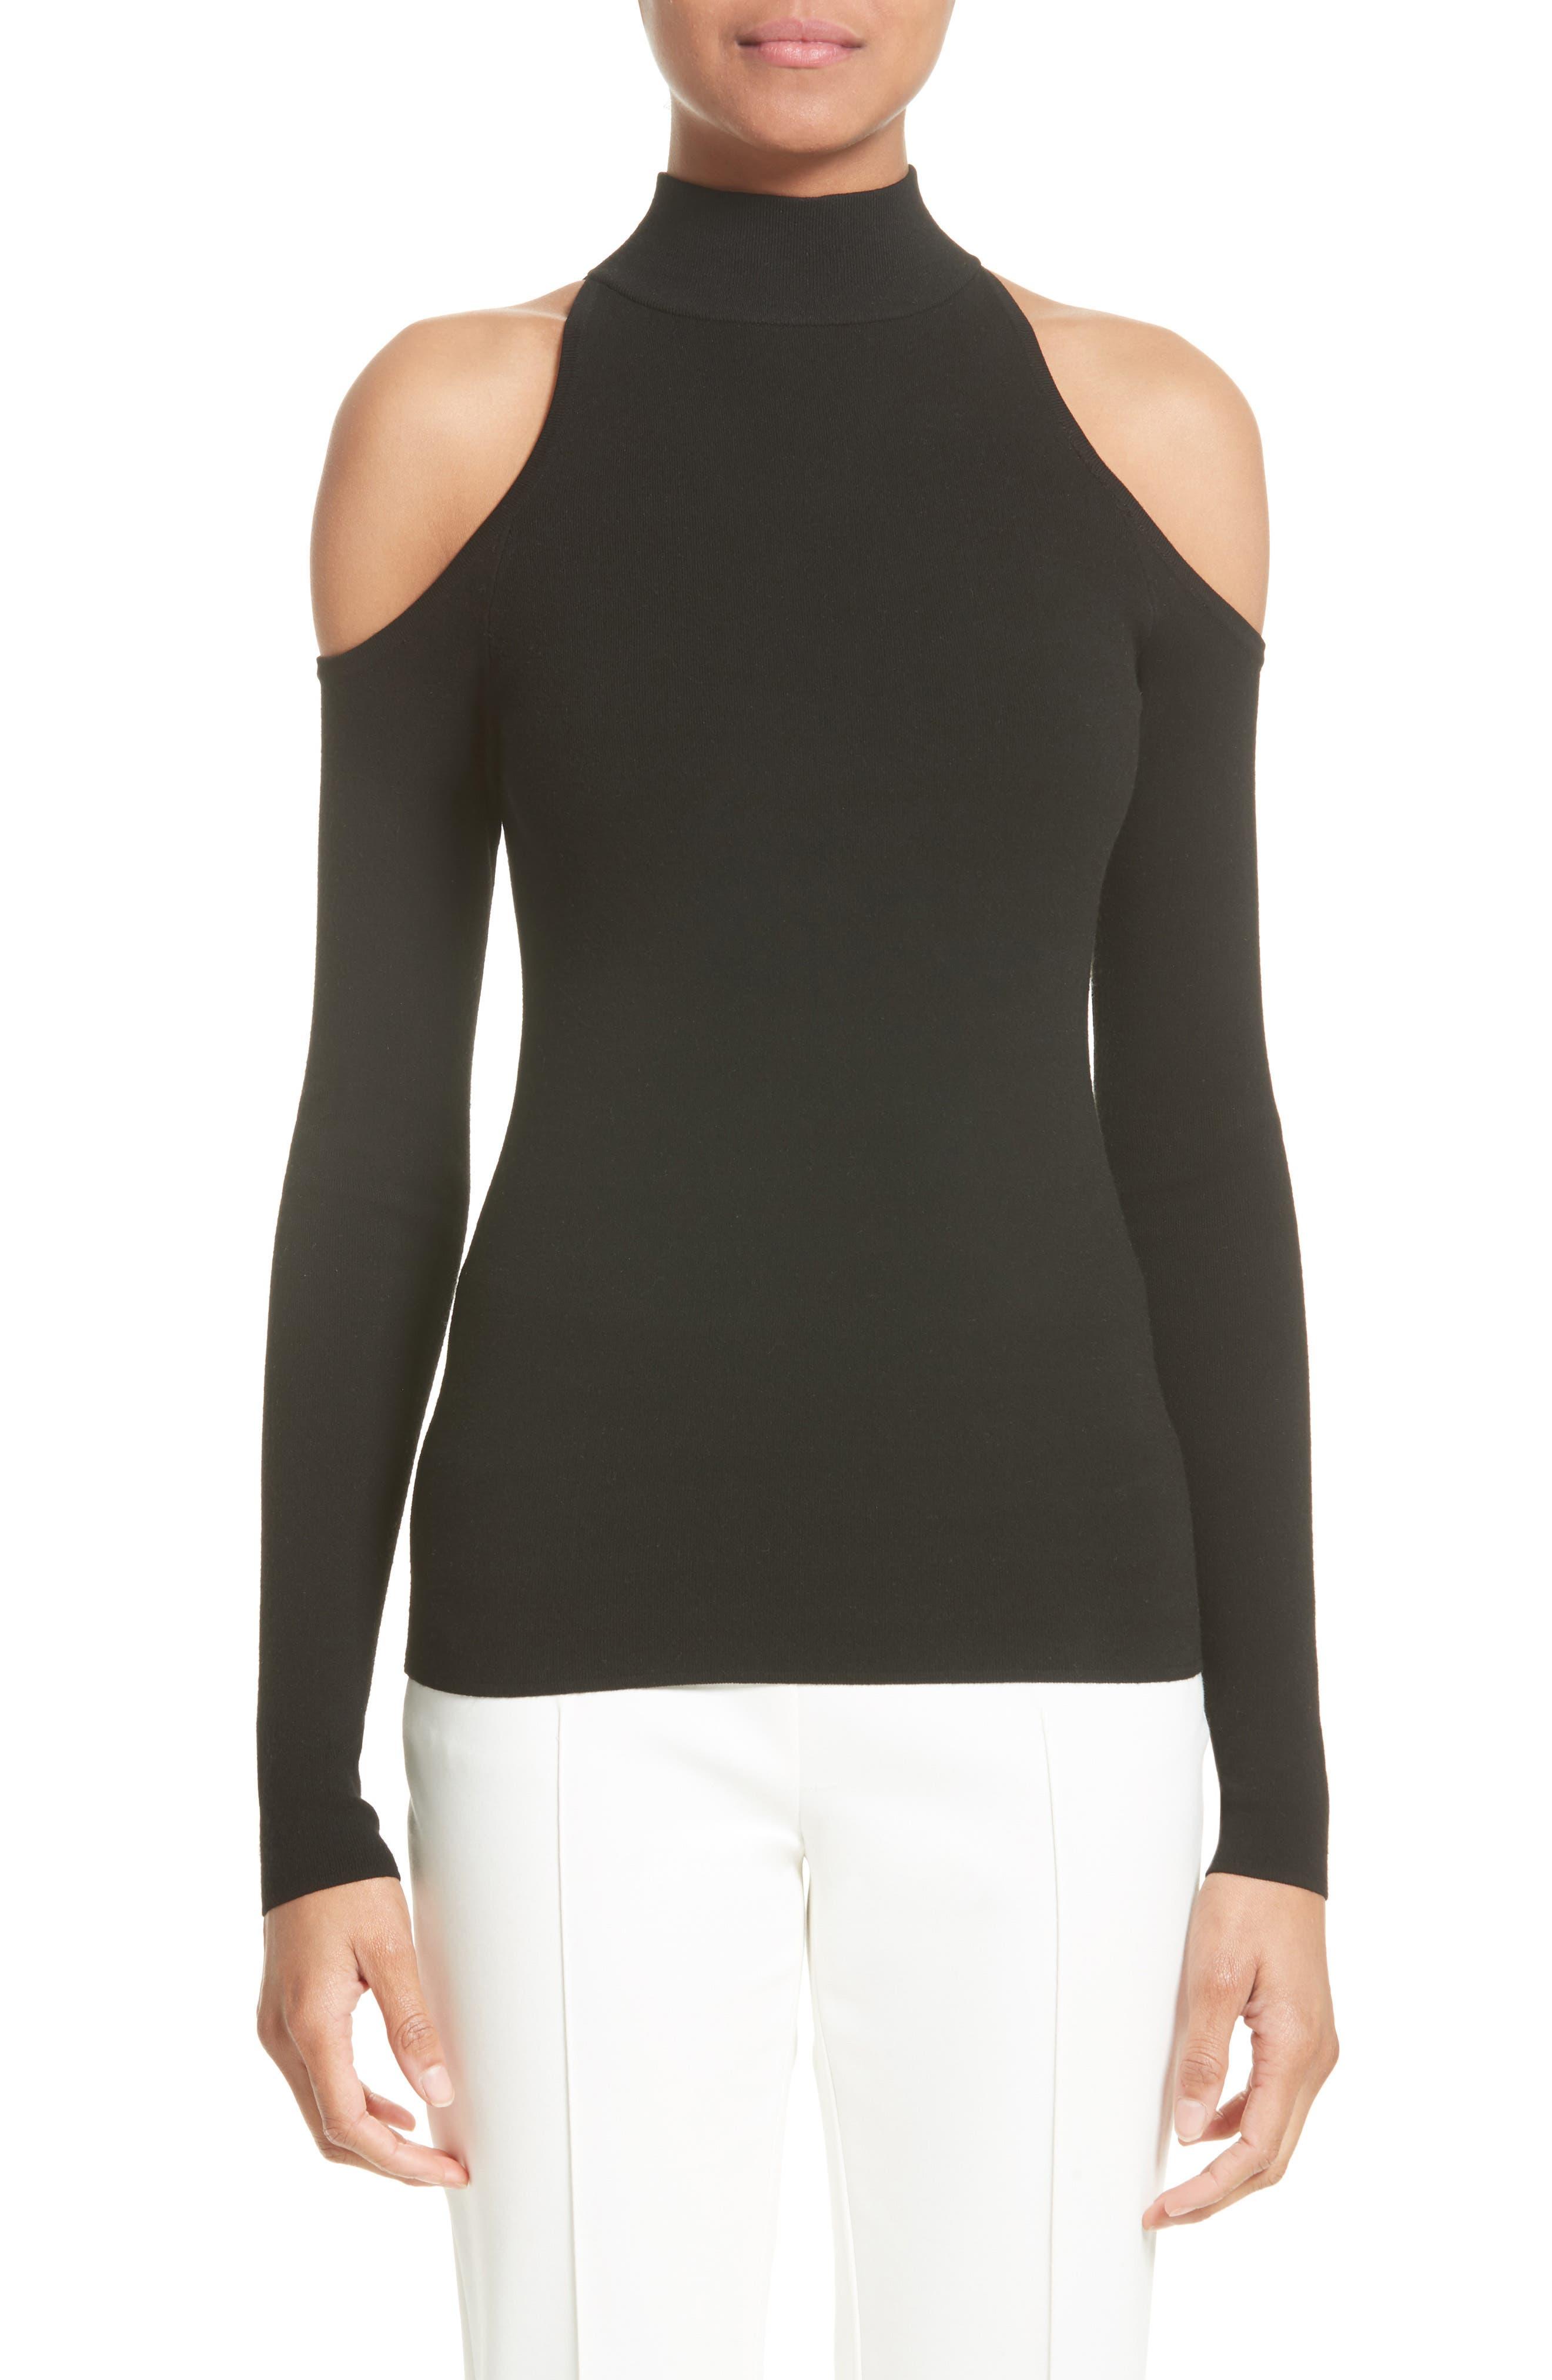 Main Image - Michael Kors Cold Shoulder Stretch Knit Top